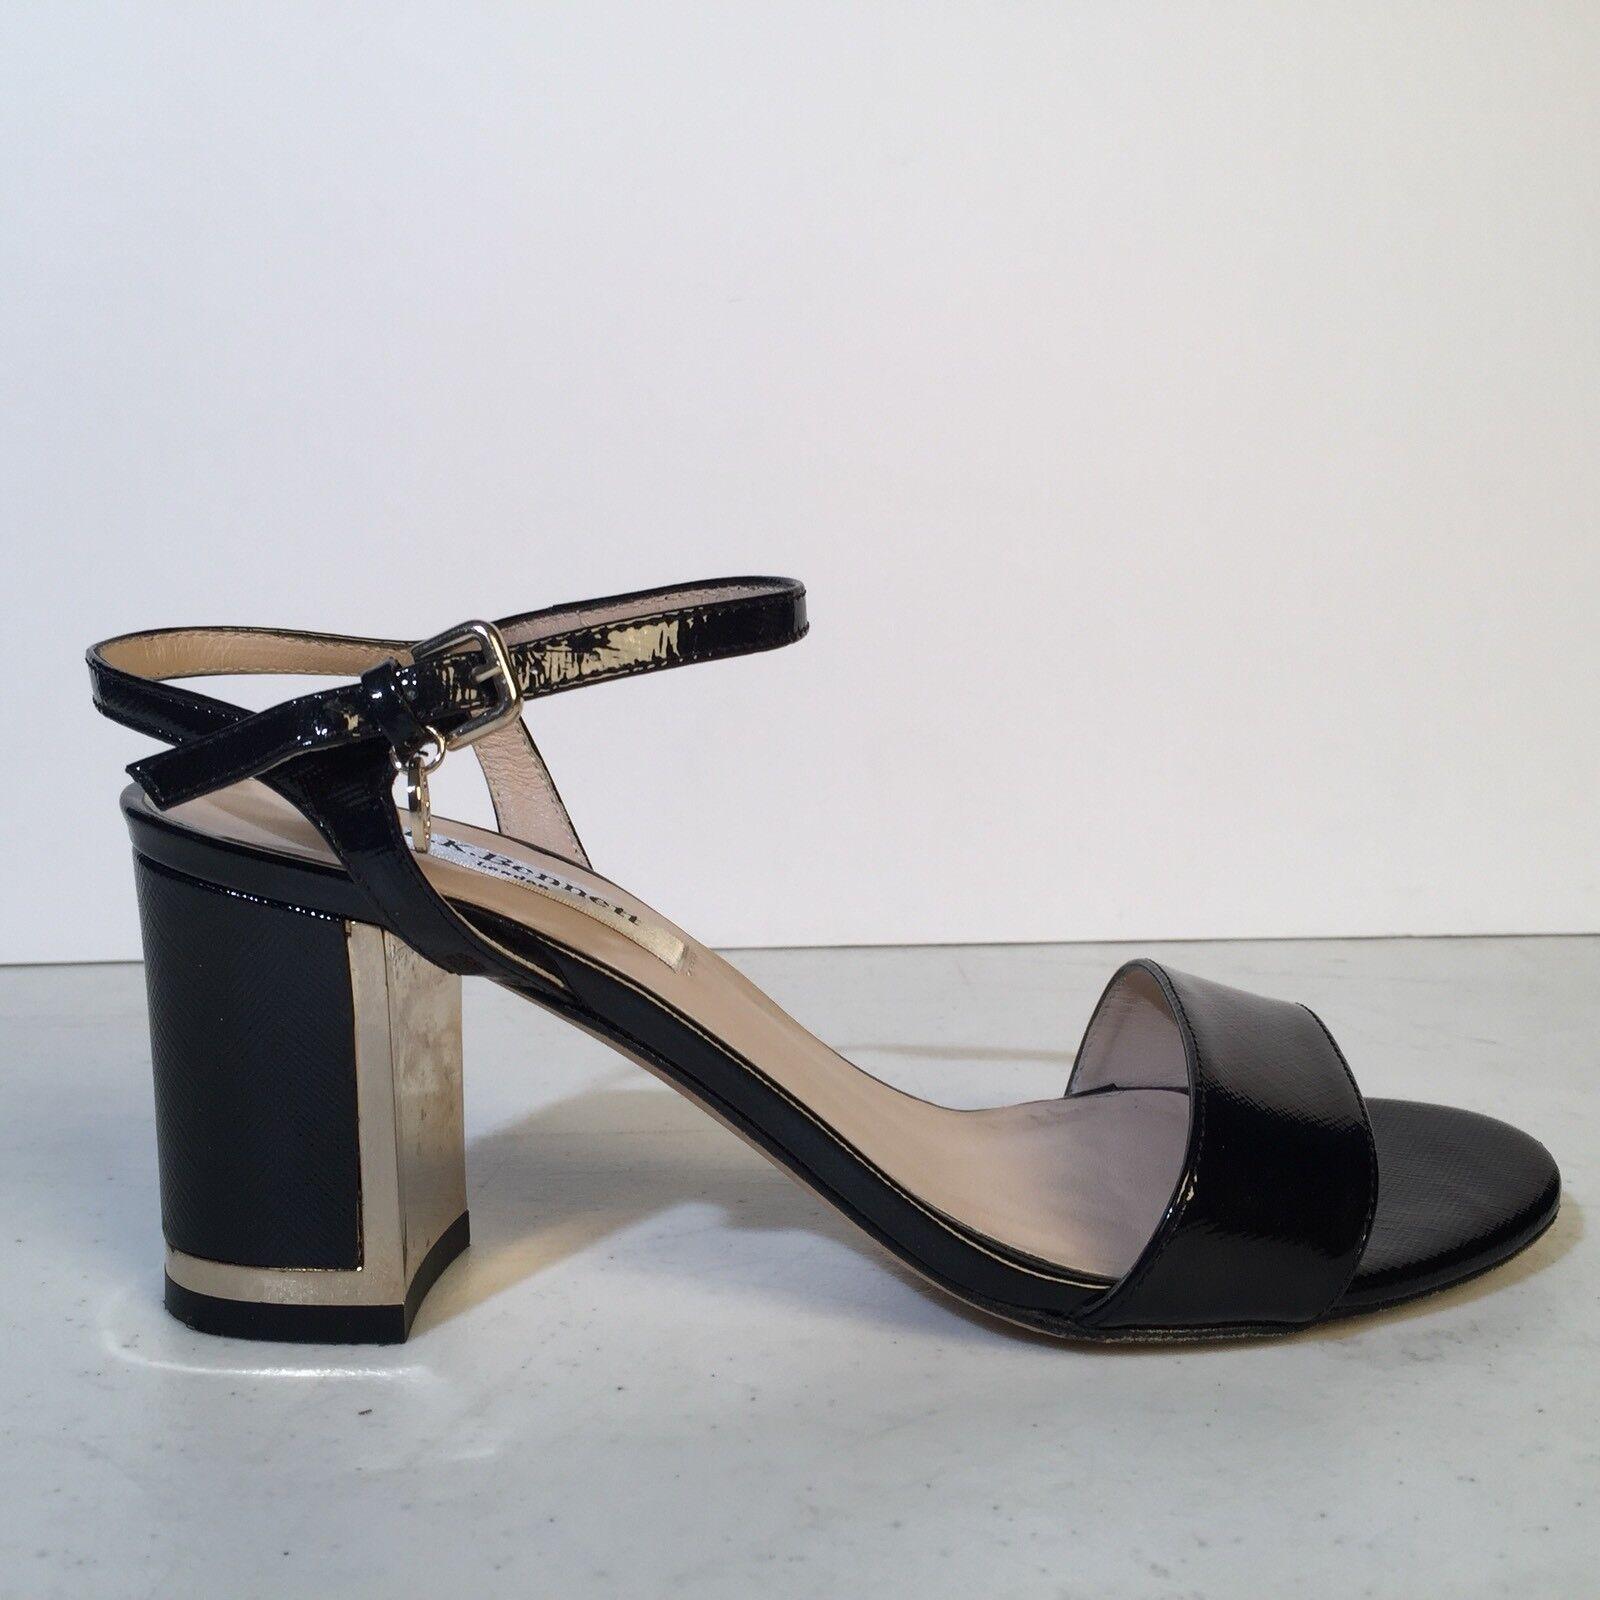 L.K. BENNETT london Black Leather MORGAN Sandals 36 $325 Saffiano Block Heel